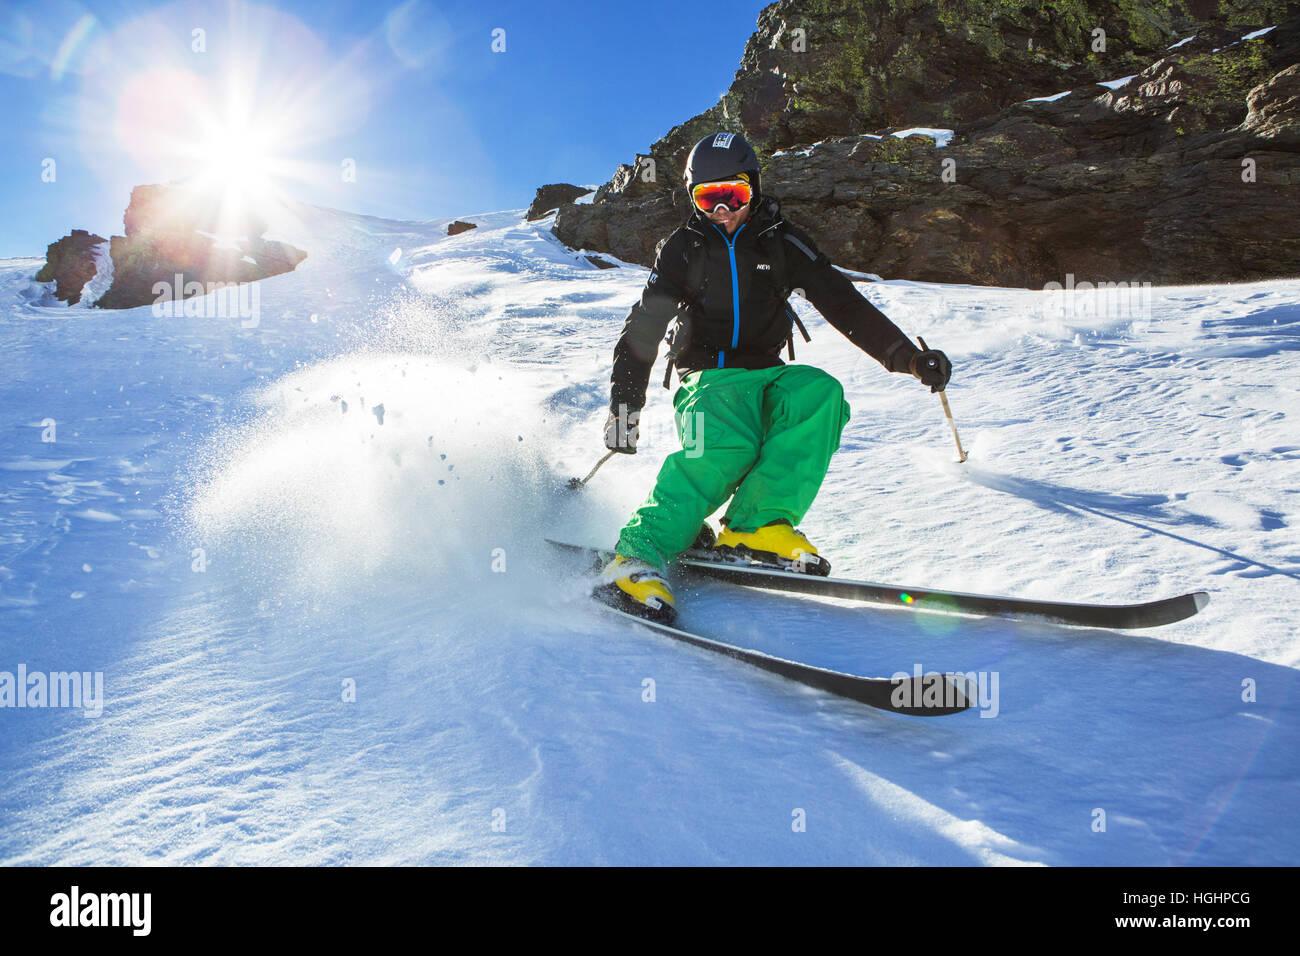 Granada, Spain. 30th of December, 2016. Kevin Blanc freeride skier goes near by the Veleta peak in the Sierra Nevada, - Stock Image